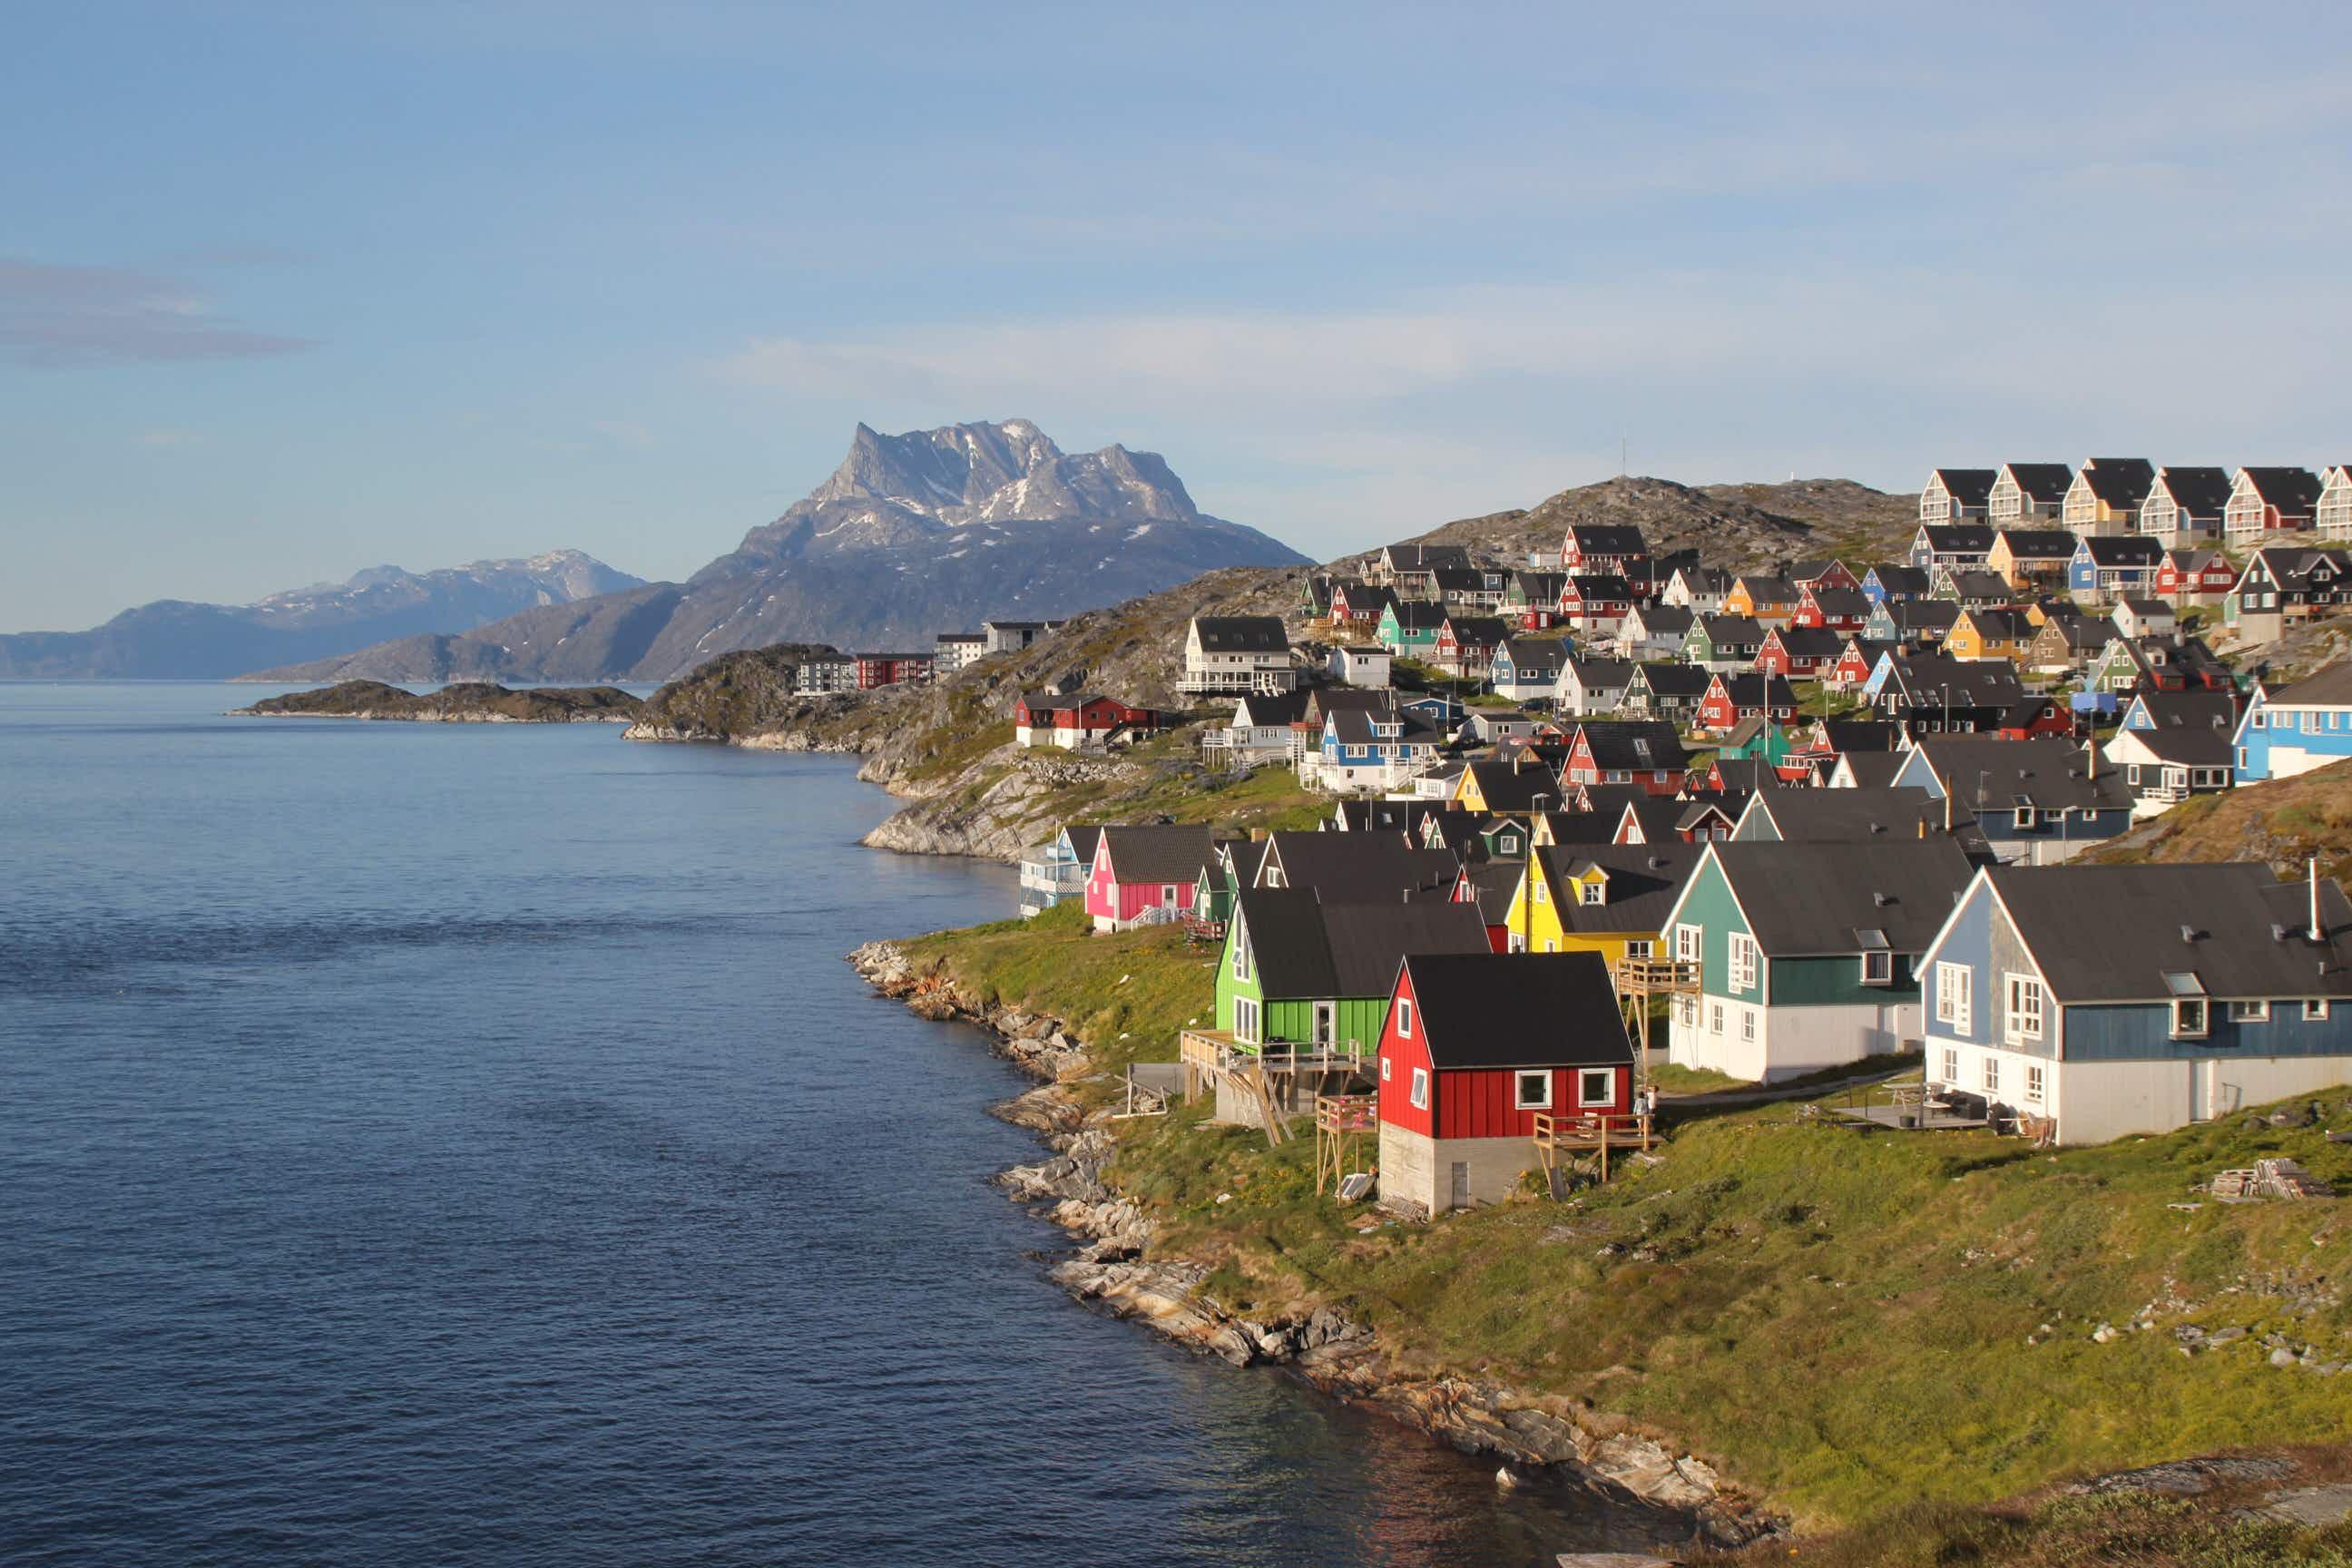 Cool Nuuk: Greenland's burgeoning capital city